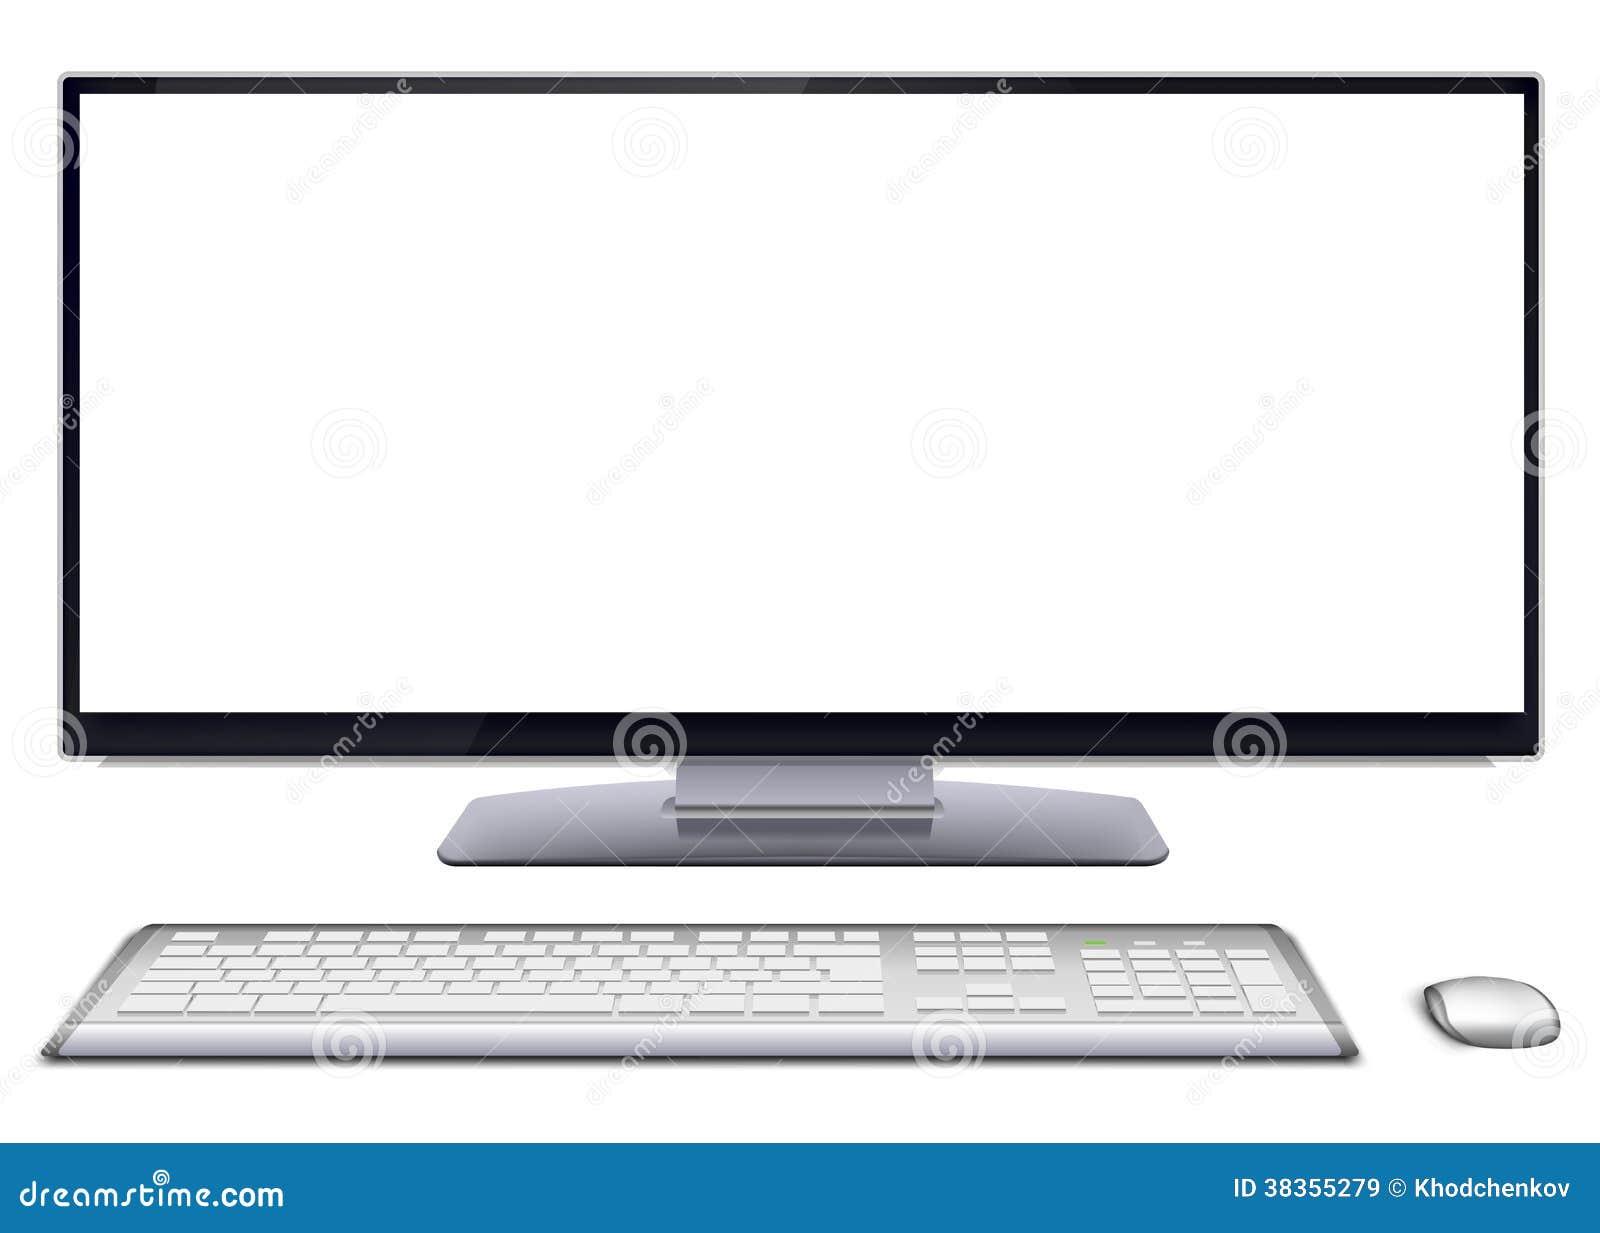 how to fix white block on desktop